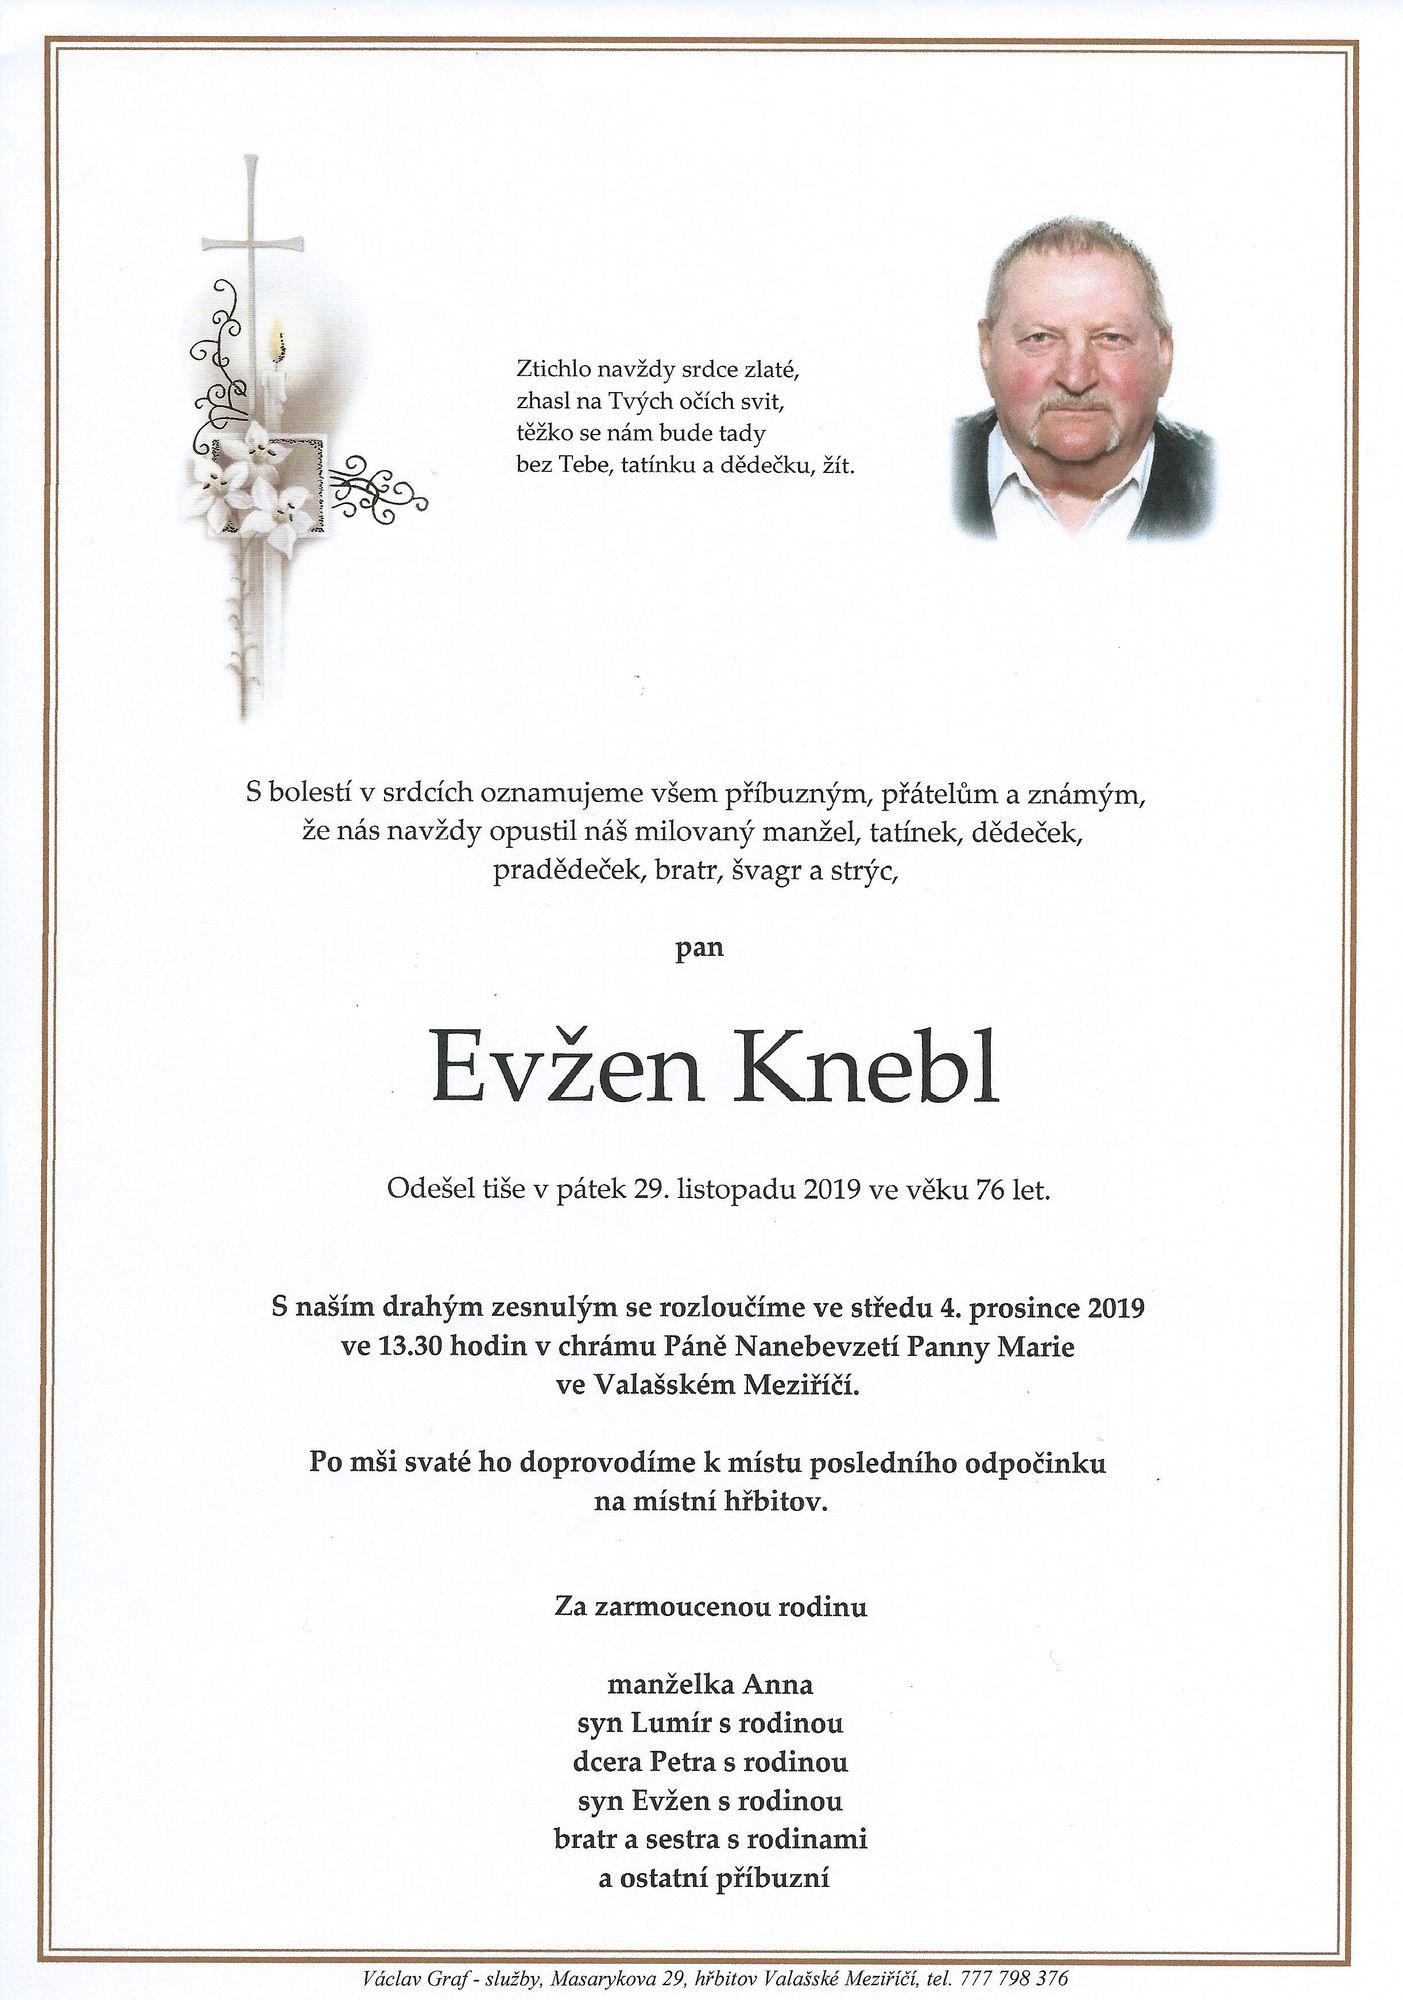 Evžen Knebl